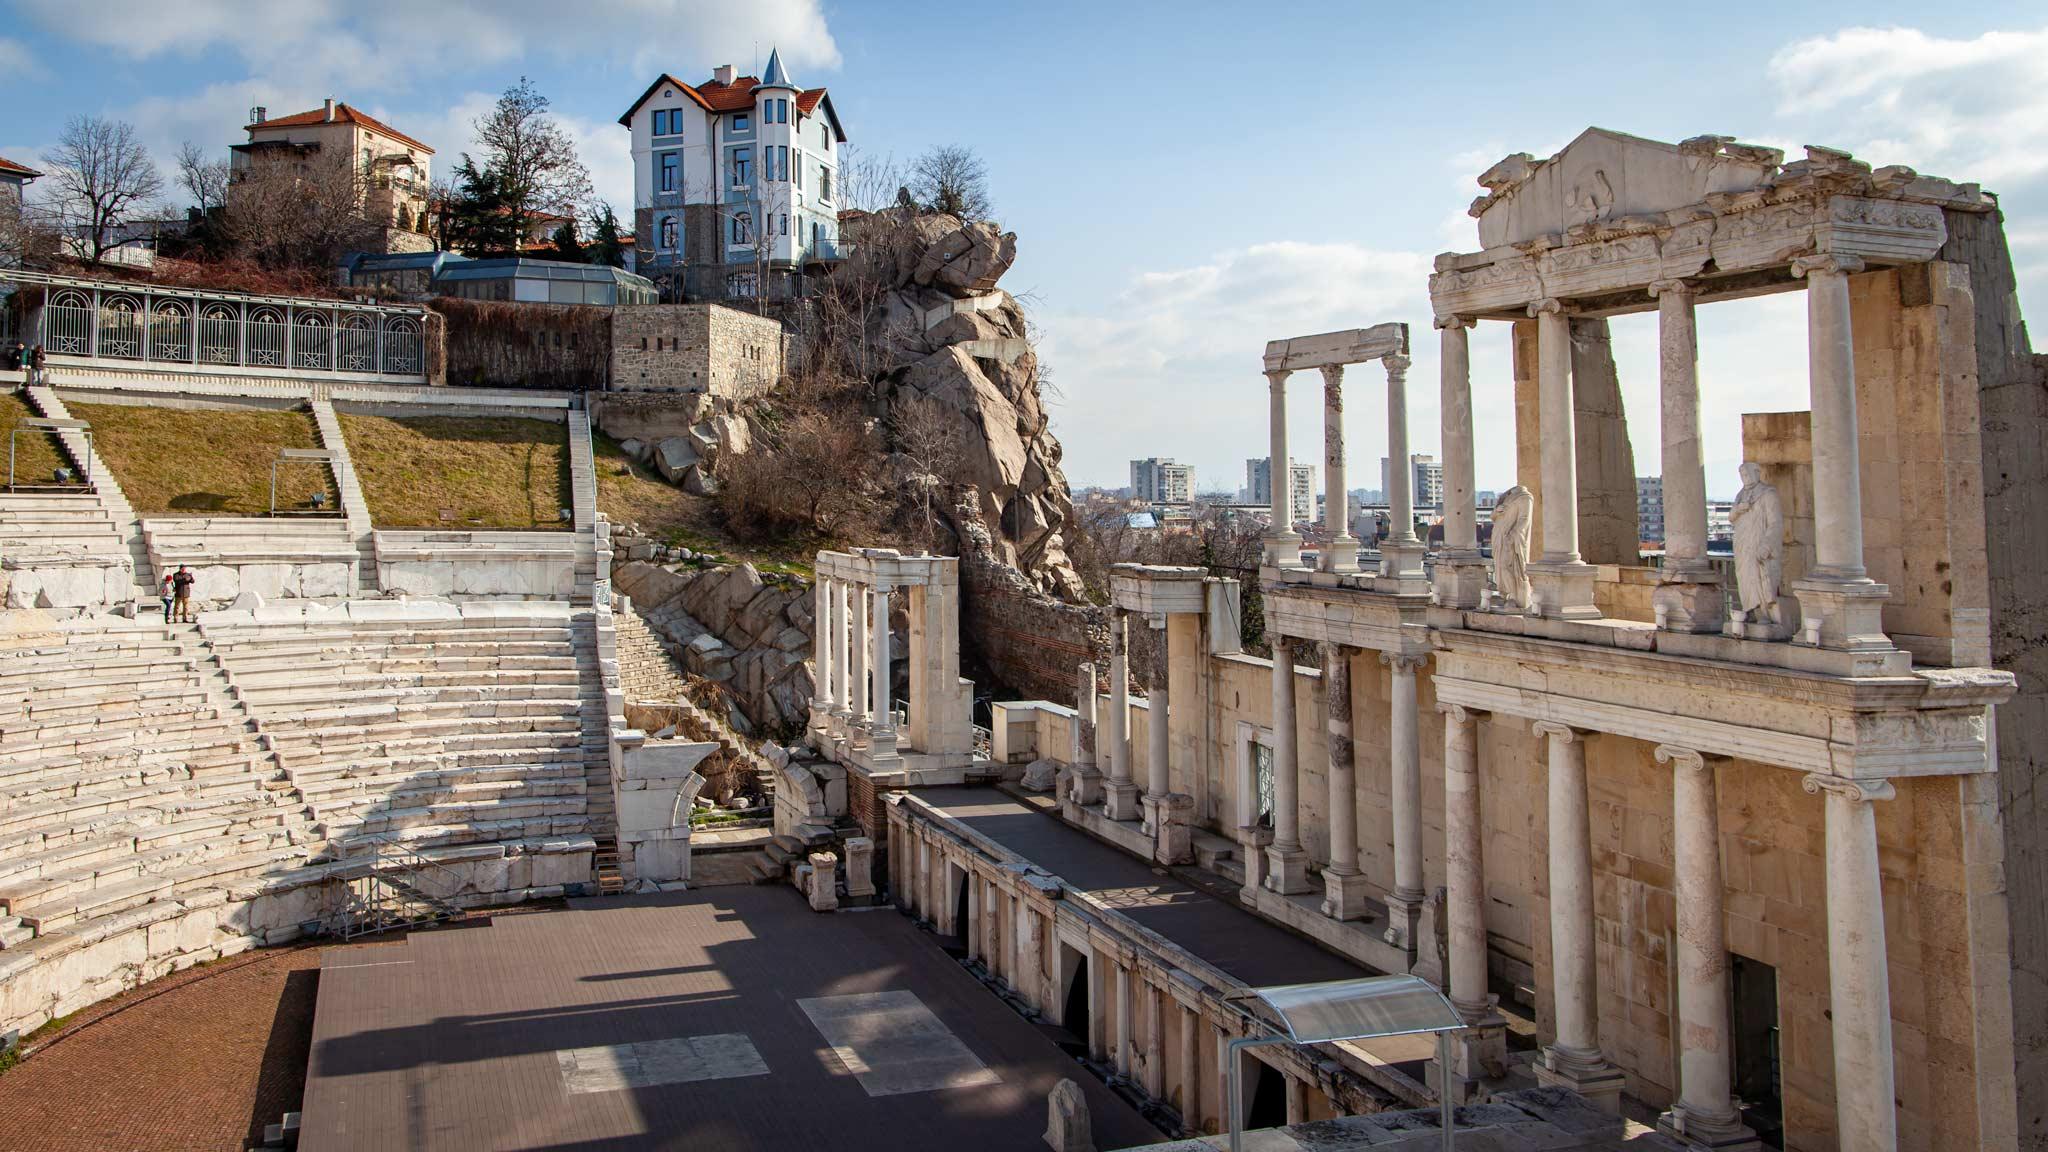 The old Roman amphitheatre in Plovdiv, Bulgaria